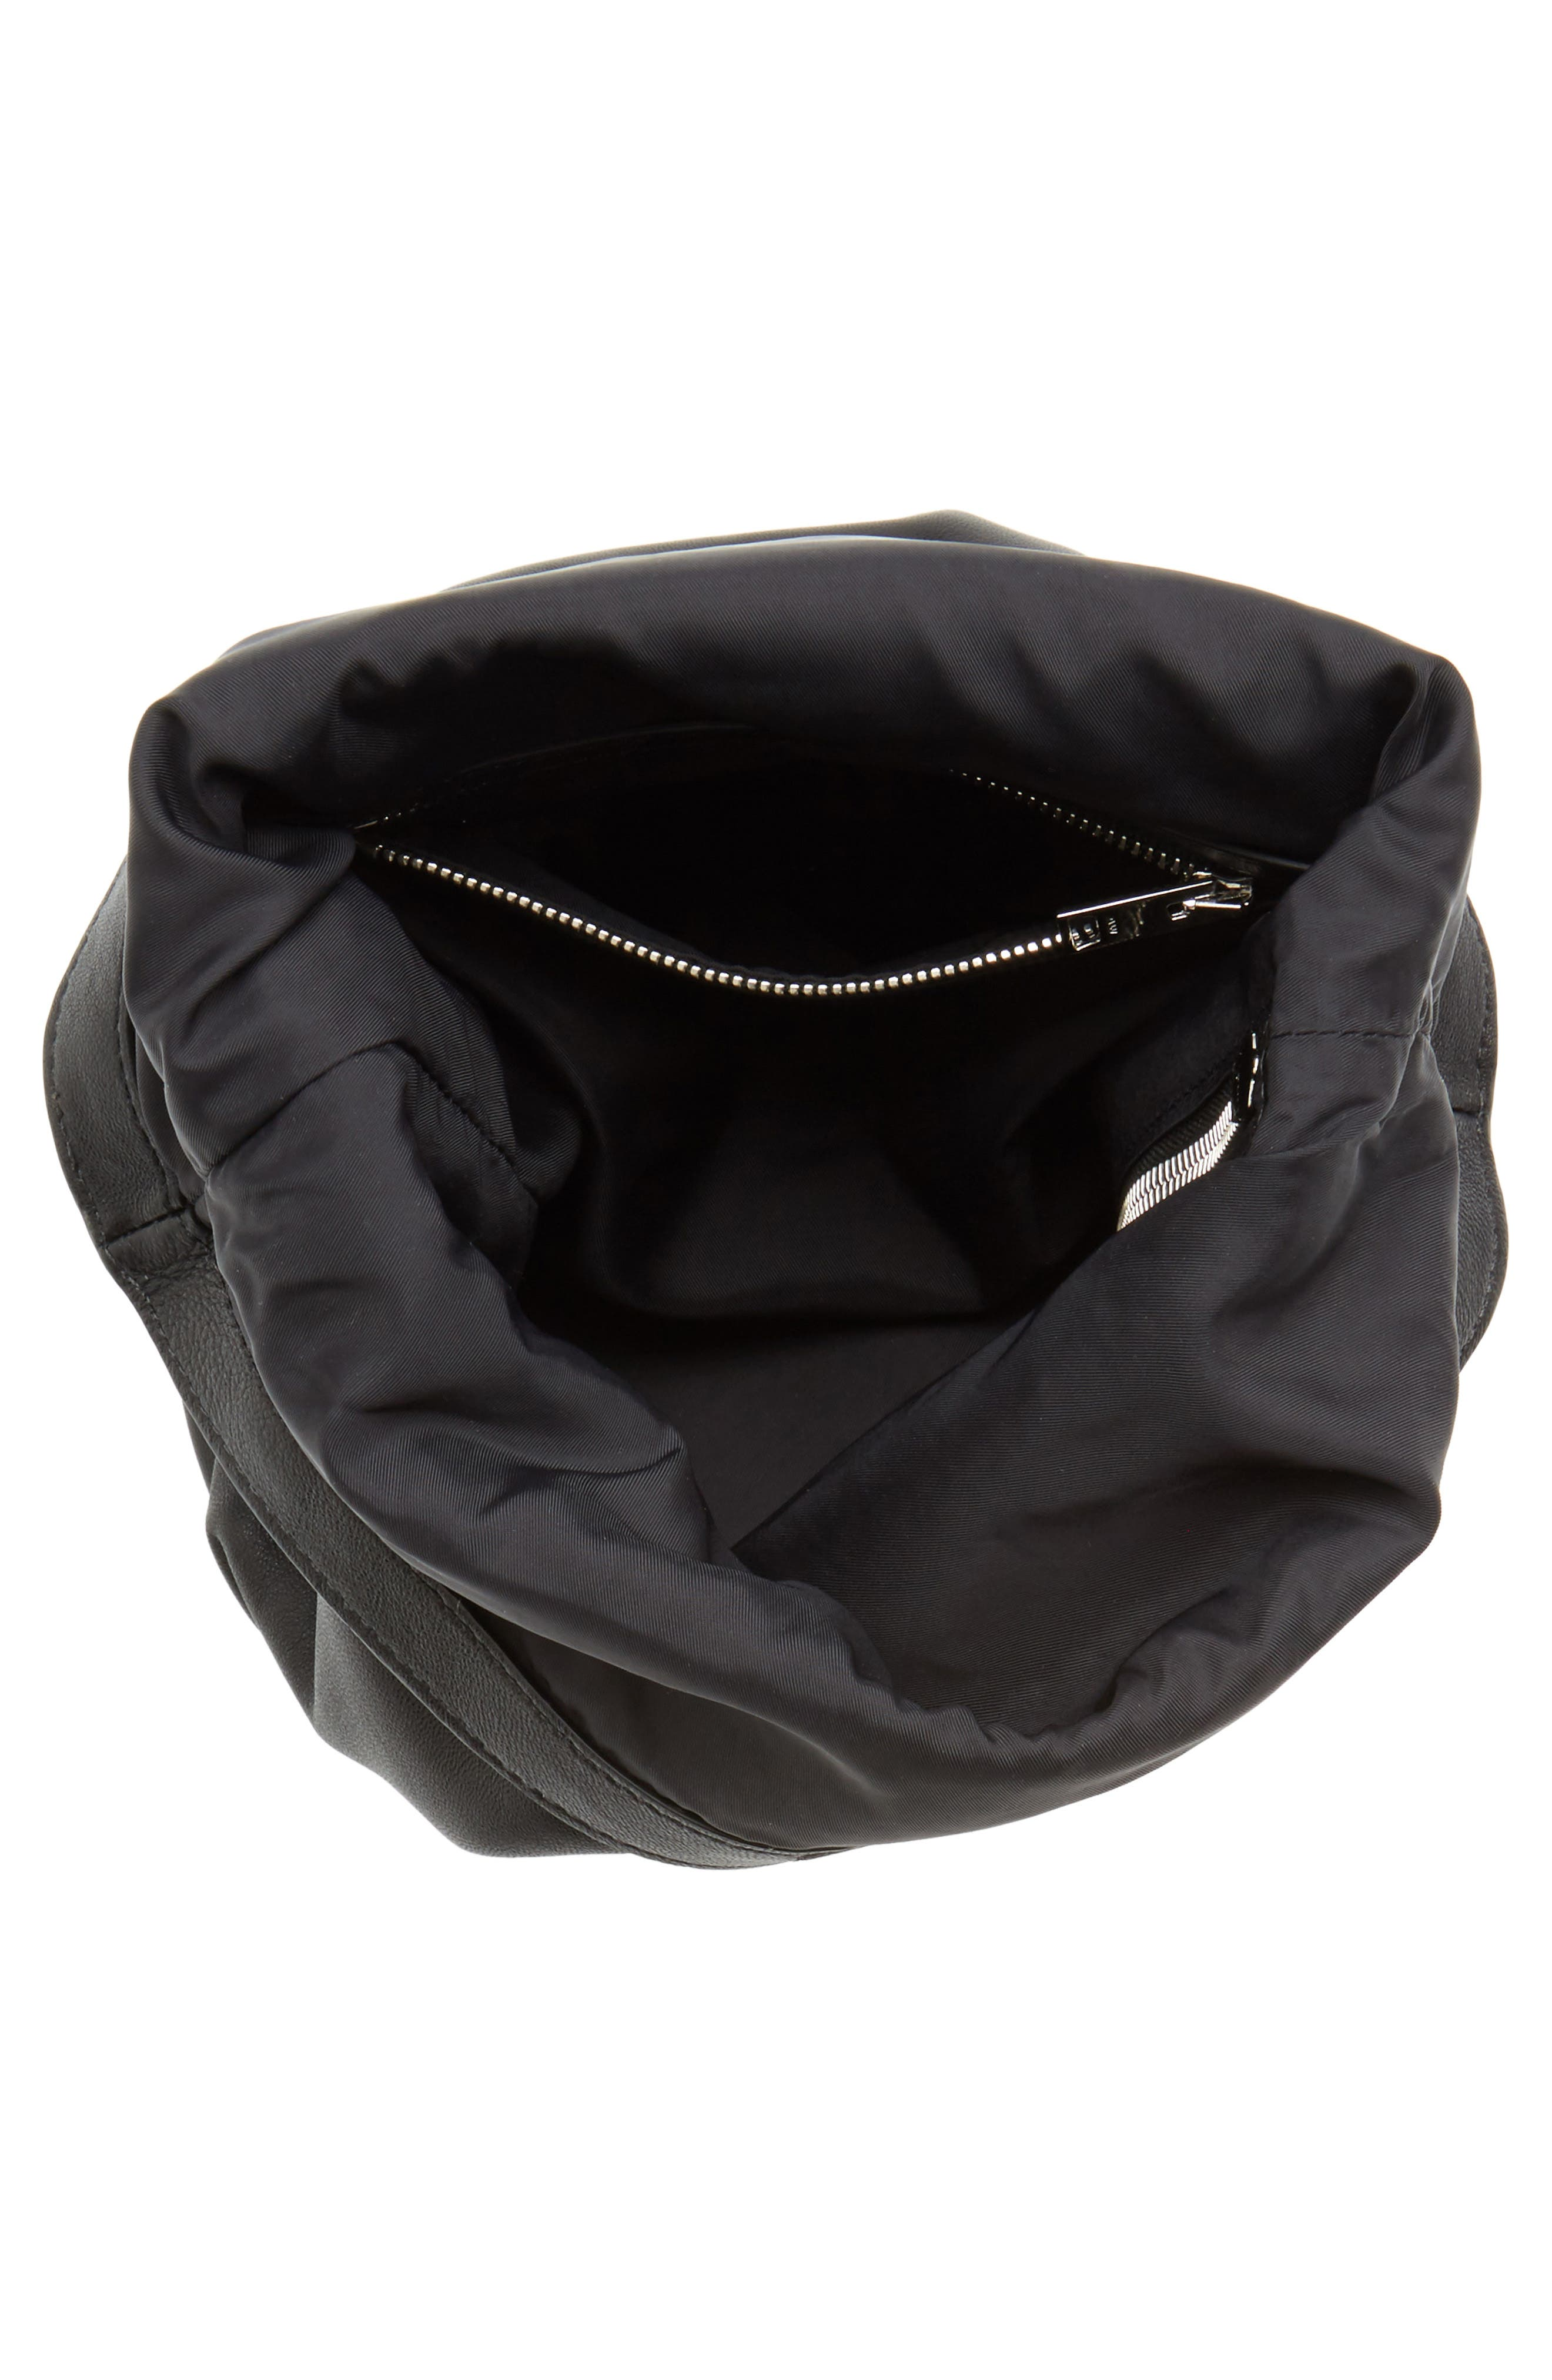 Attica Leather Bucket Bag,                             Alternate thumbnail 5, color,                             BLACK